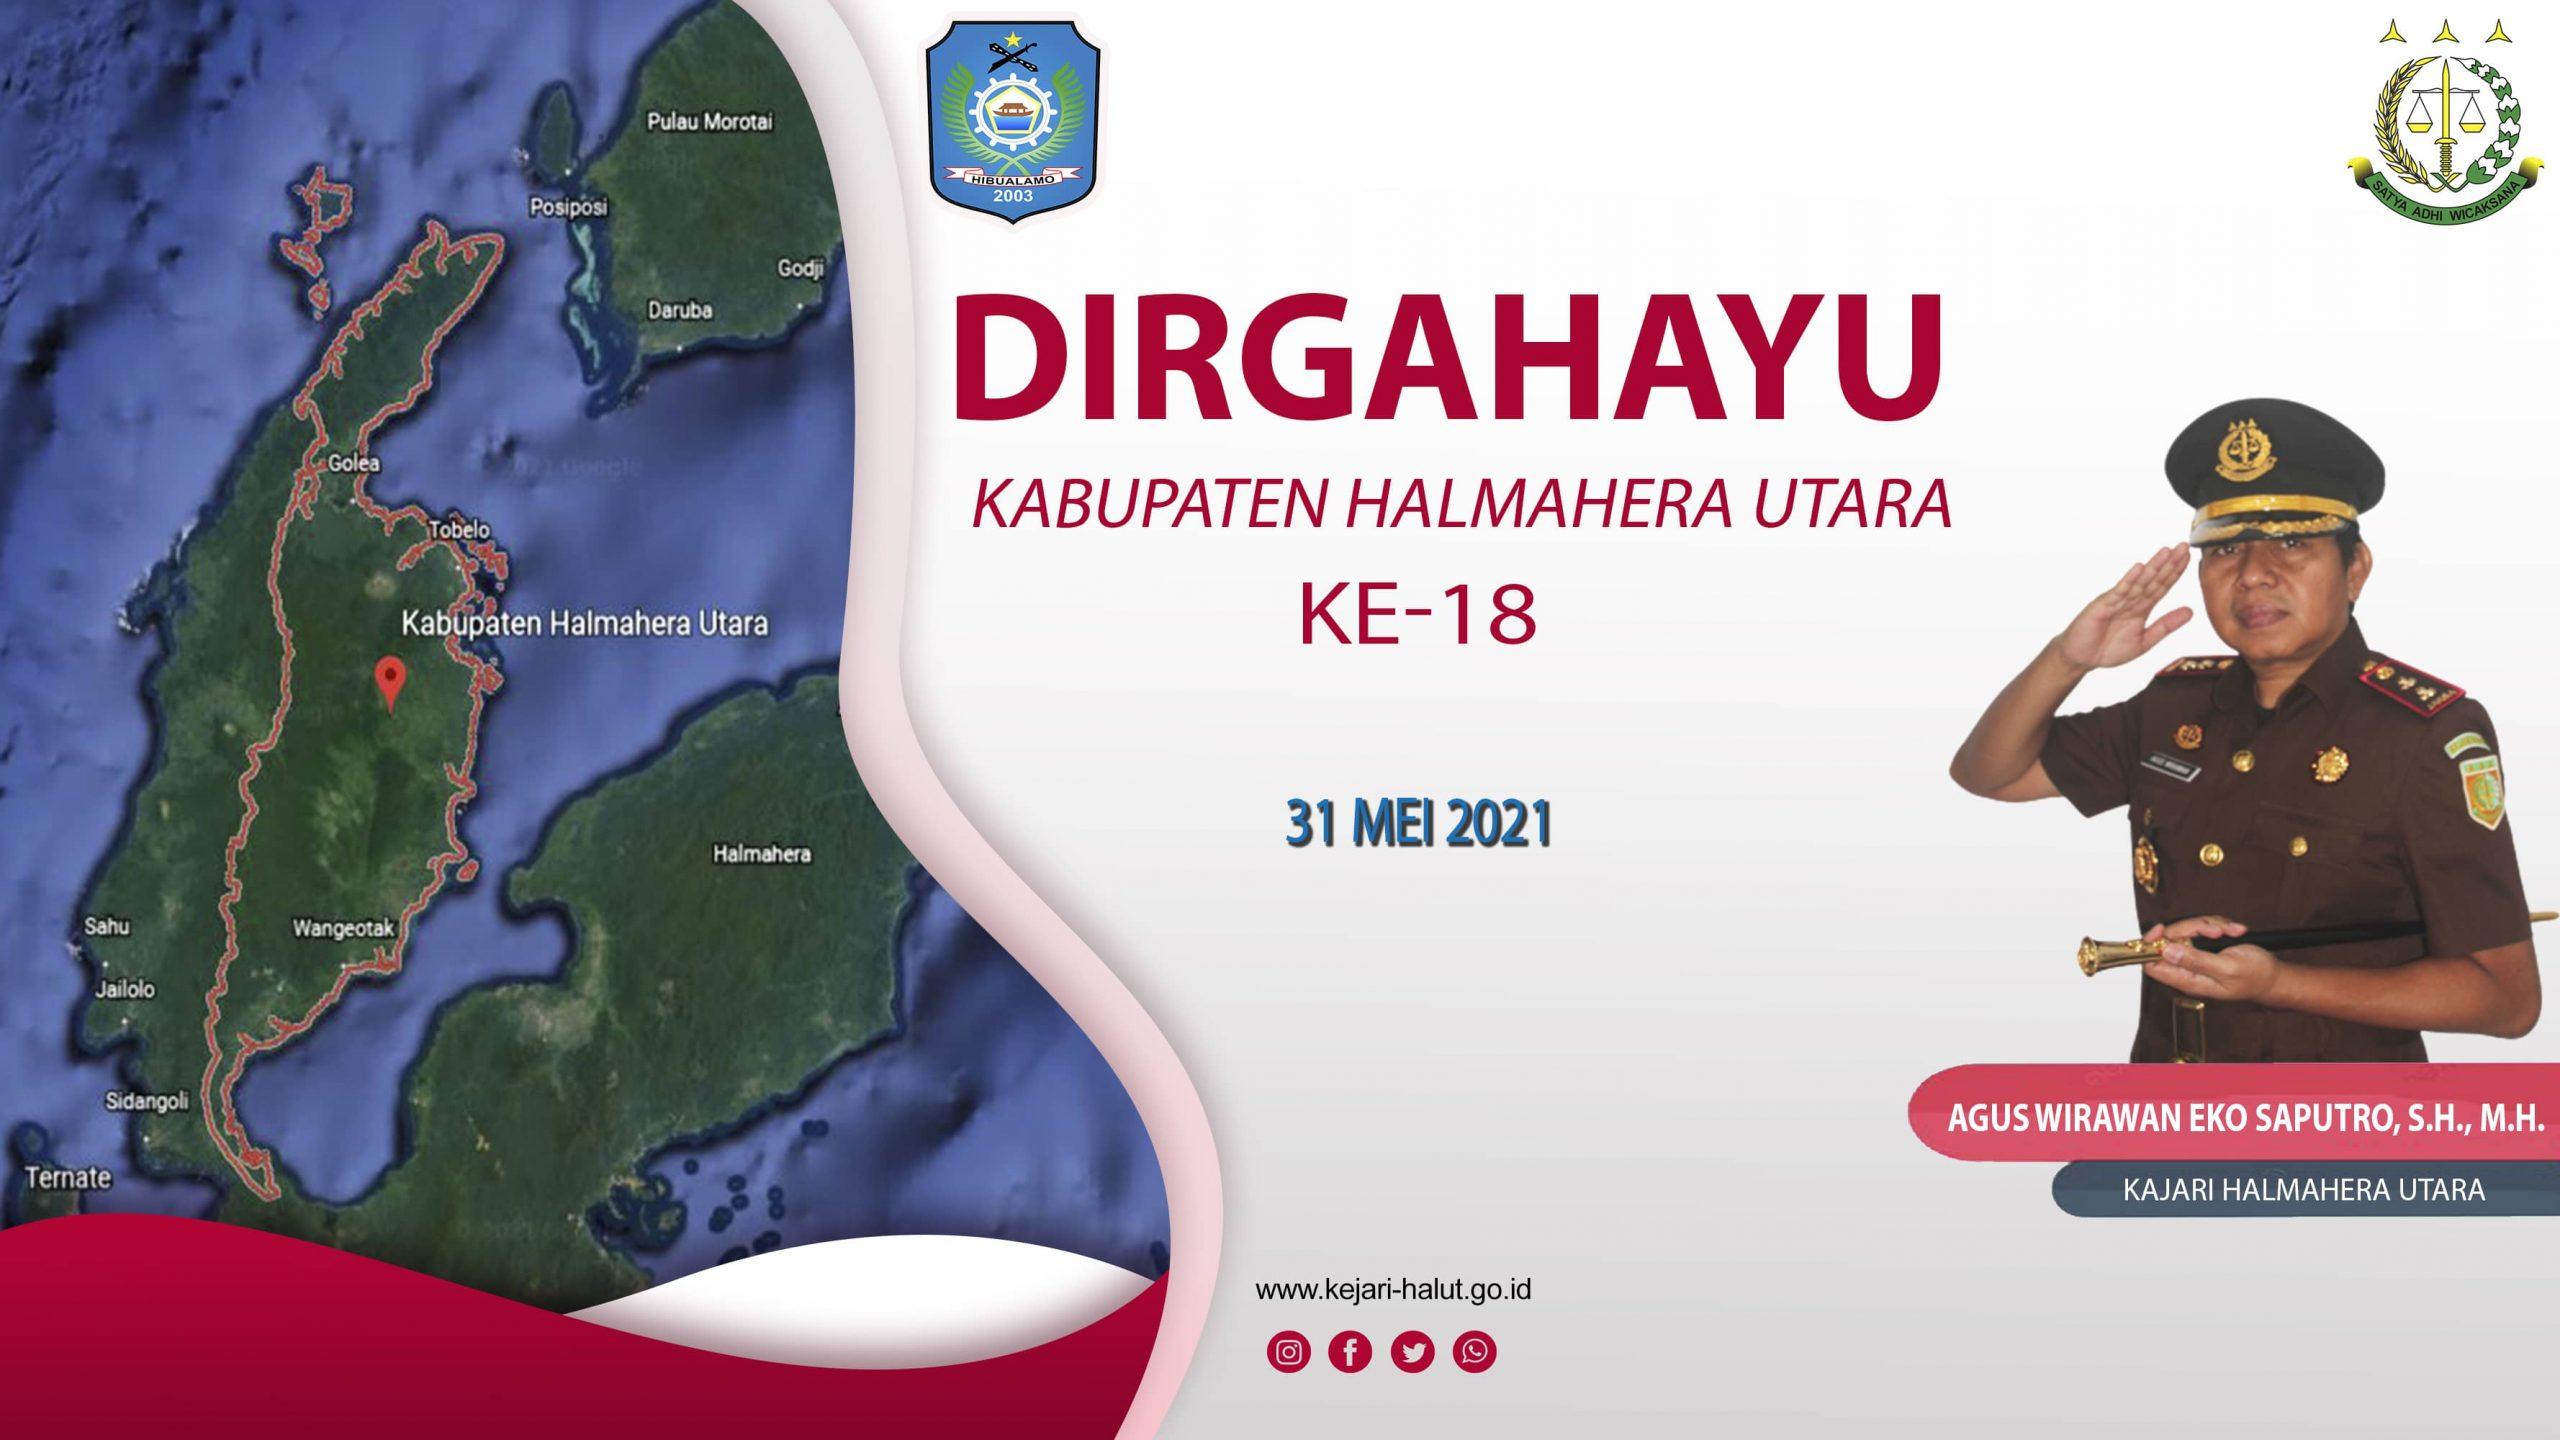 DIRGAHAYU-HALUT